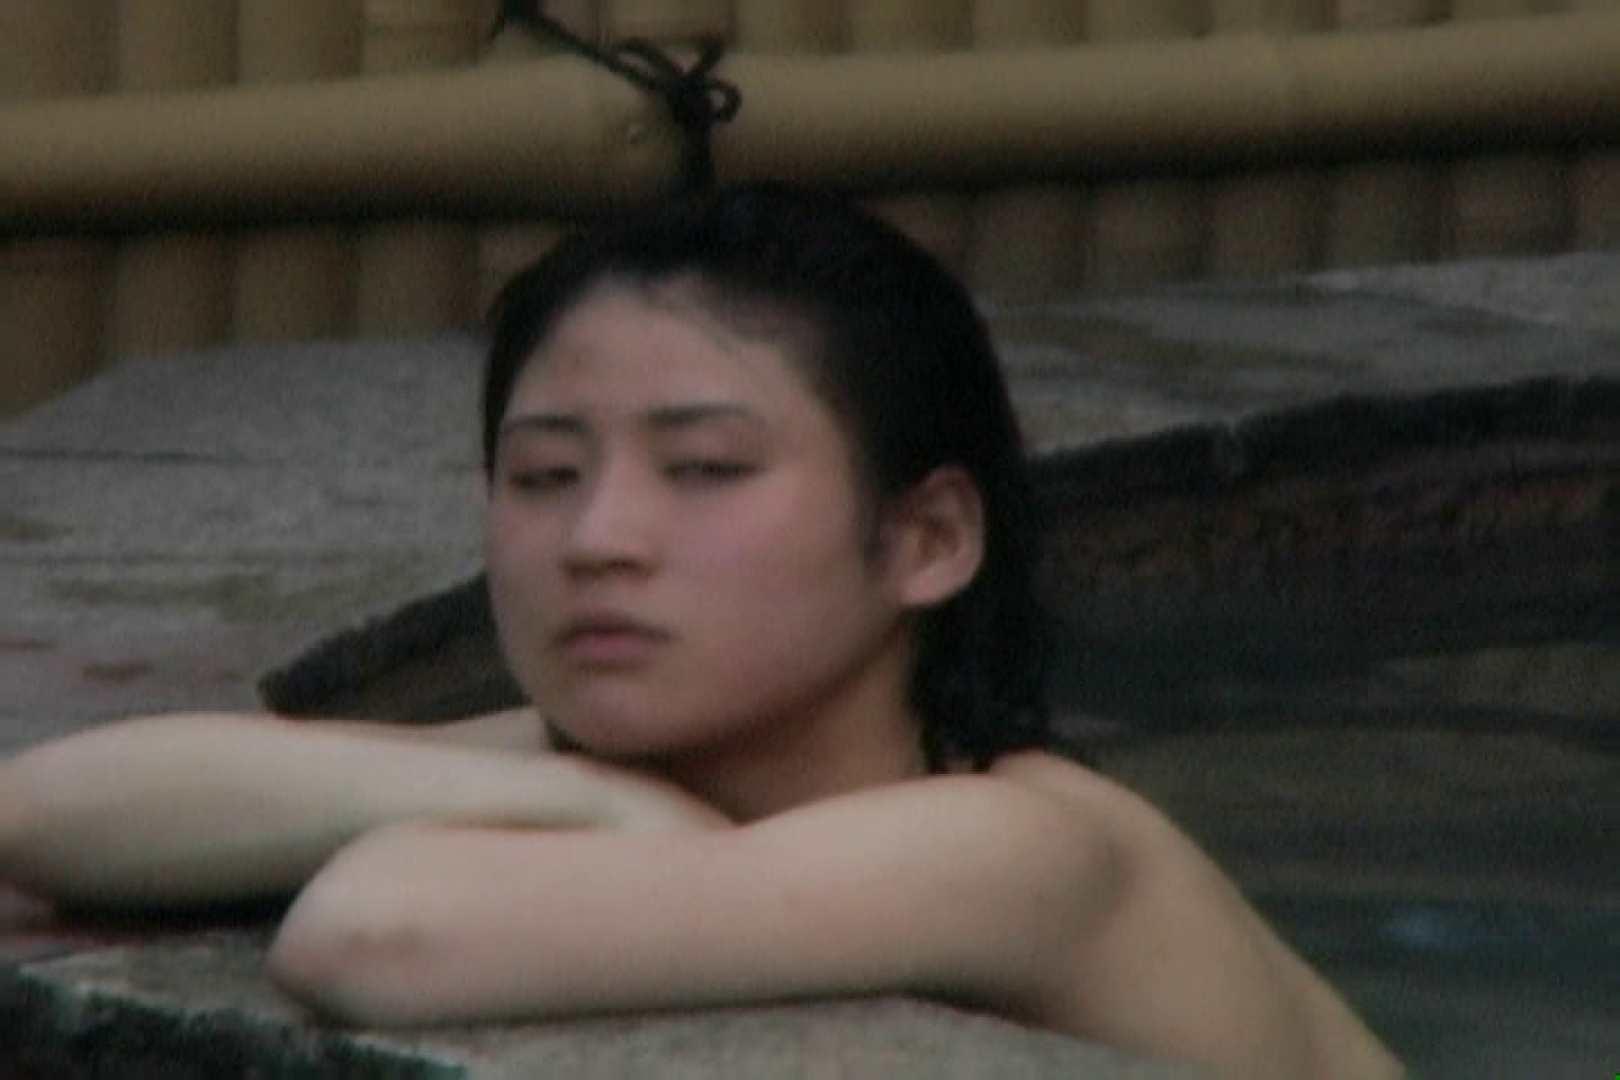 高画質露天女風呂観察 vol.004 望遠映像 すけべAV動画紹介 99PIX 83